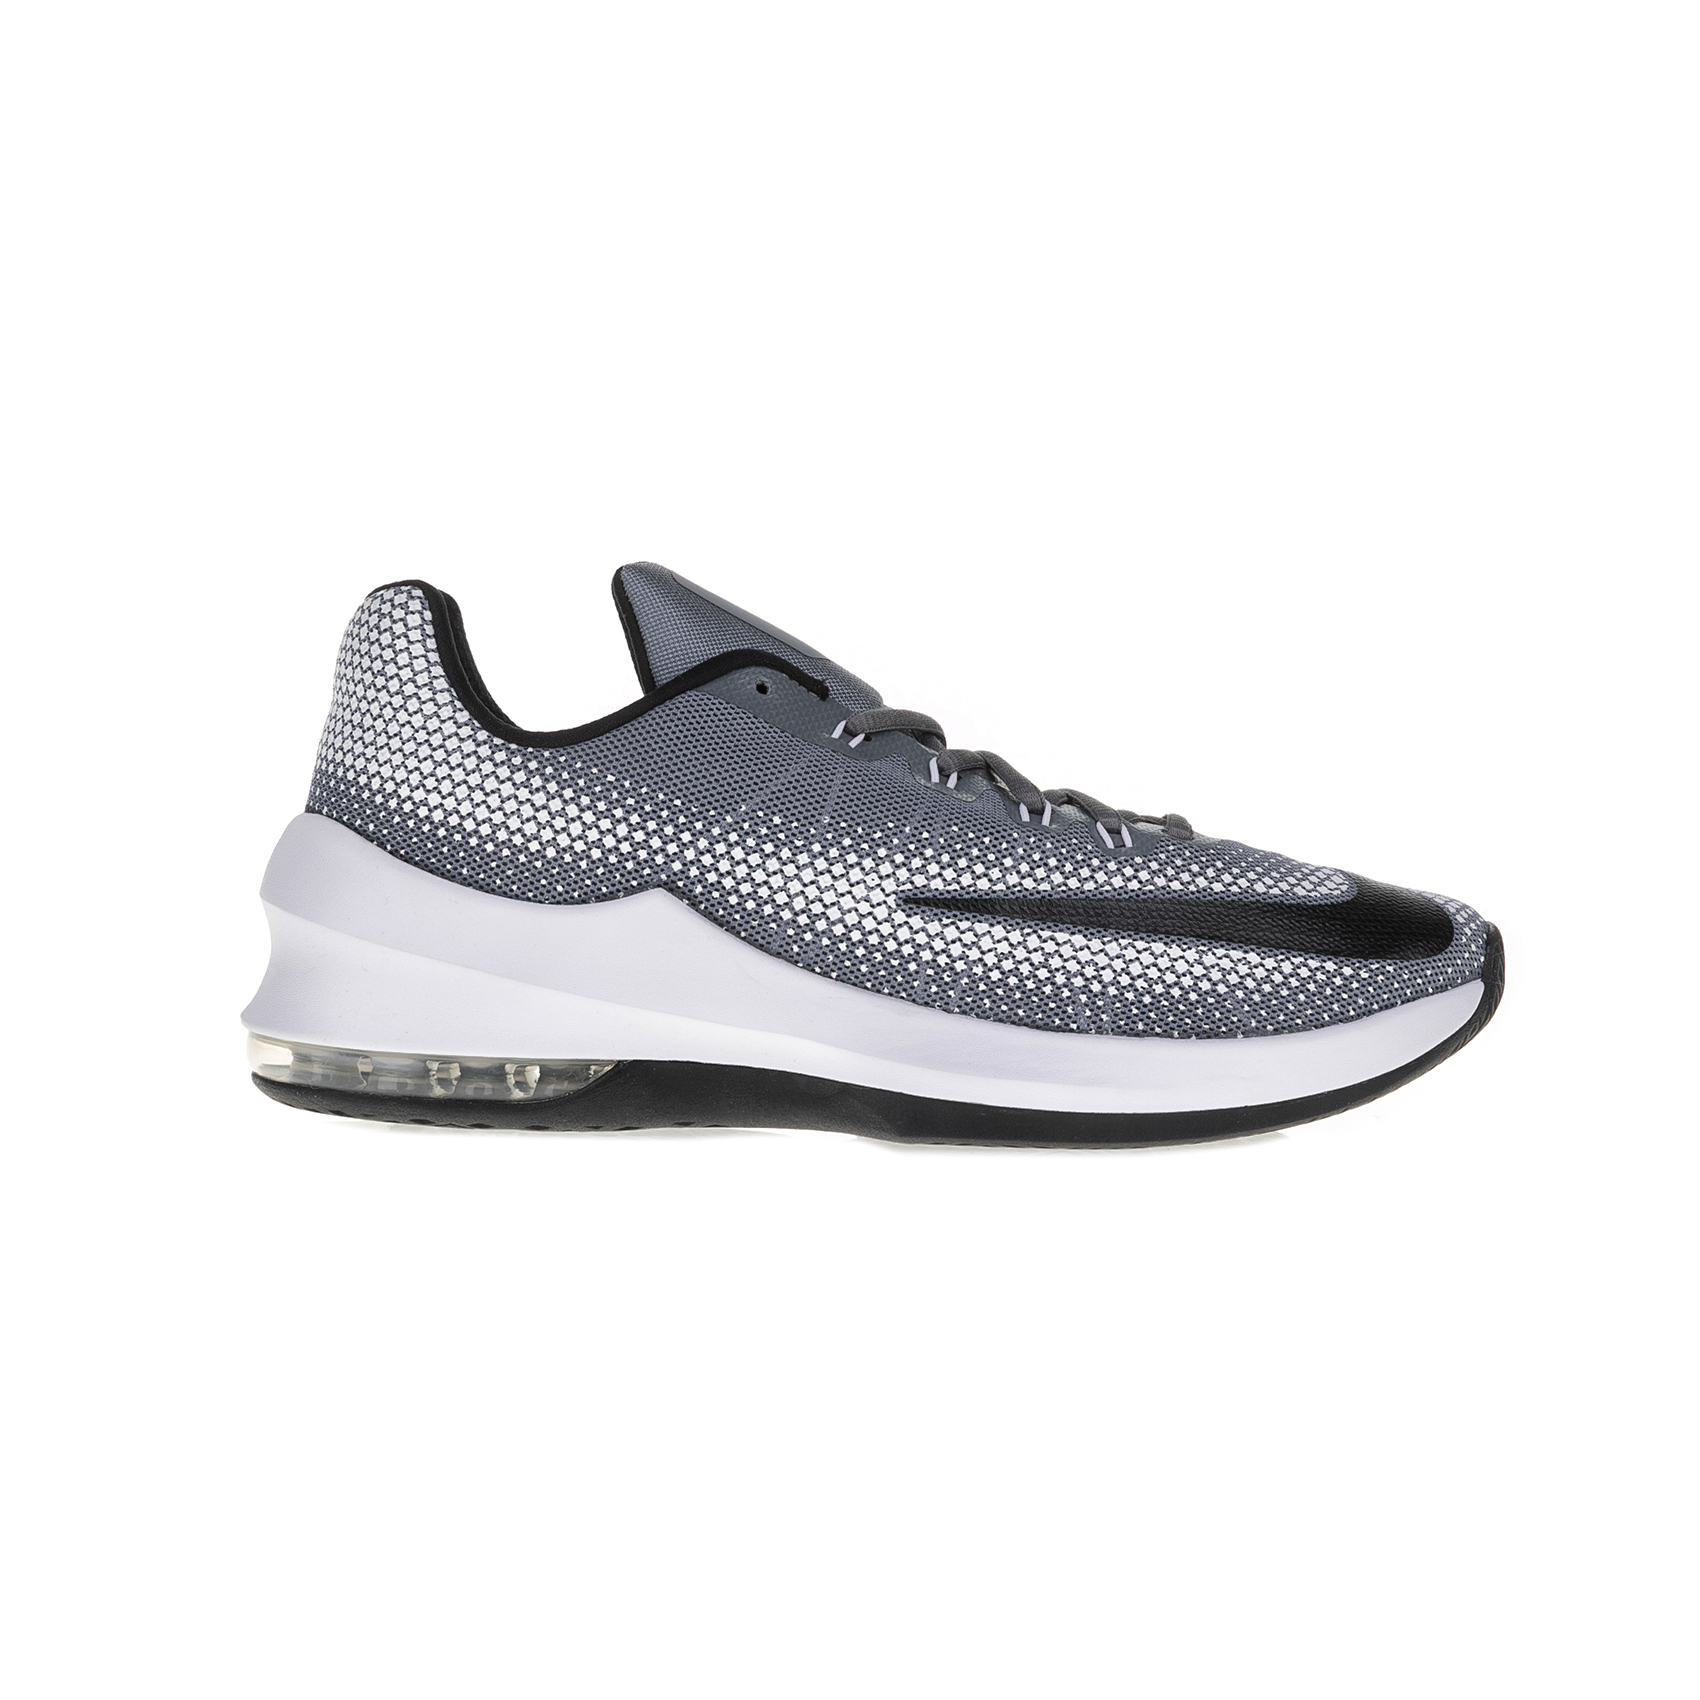 NIKE - Ανδρικά παπούτσια μπάσκετ Nike AIR MAX INFURIATE LOW λευκά - γκρι ανδρικά παπούτσια αθλητικά basketball